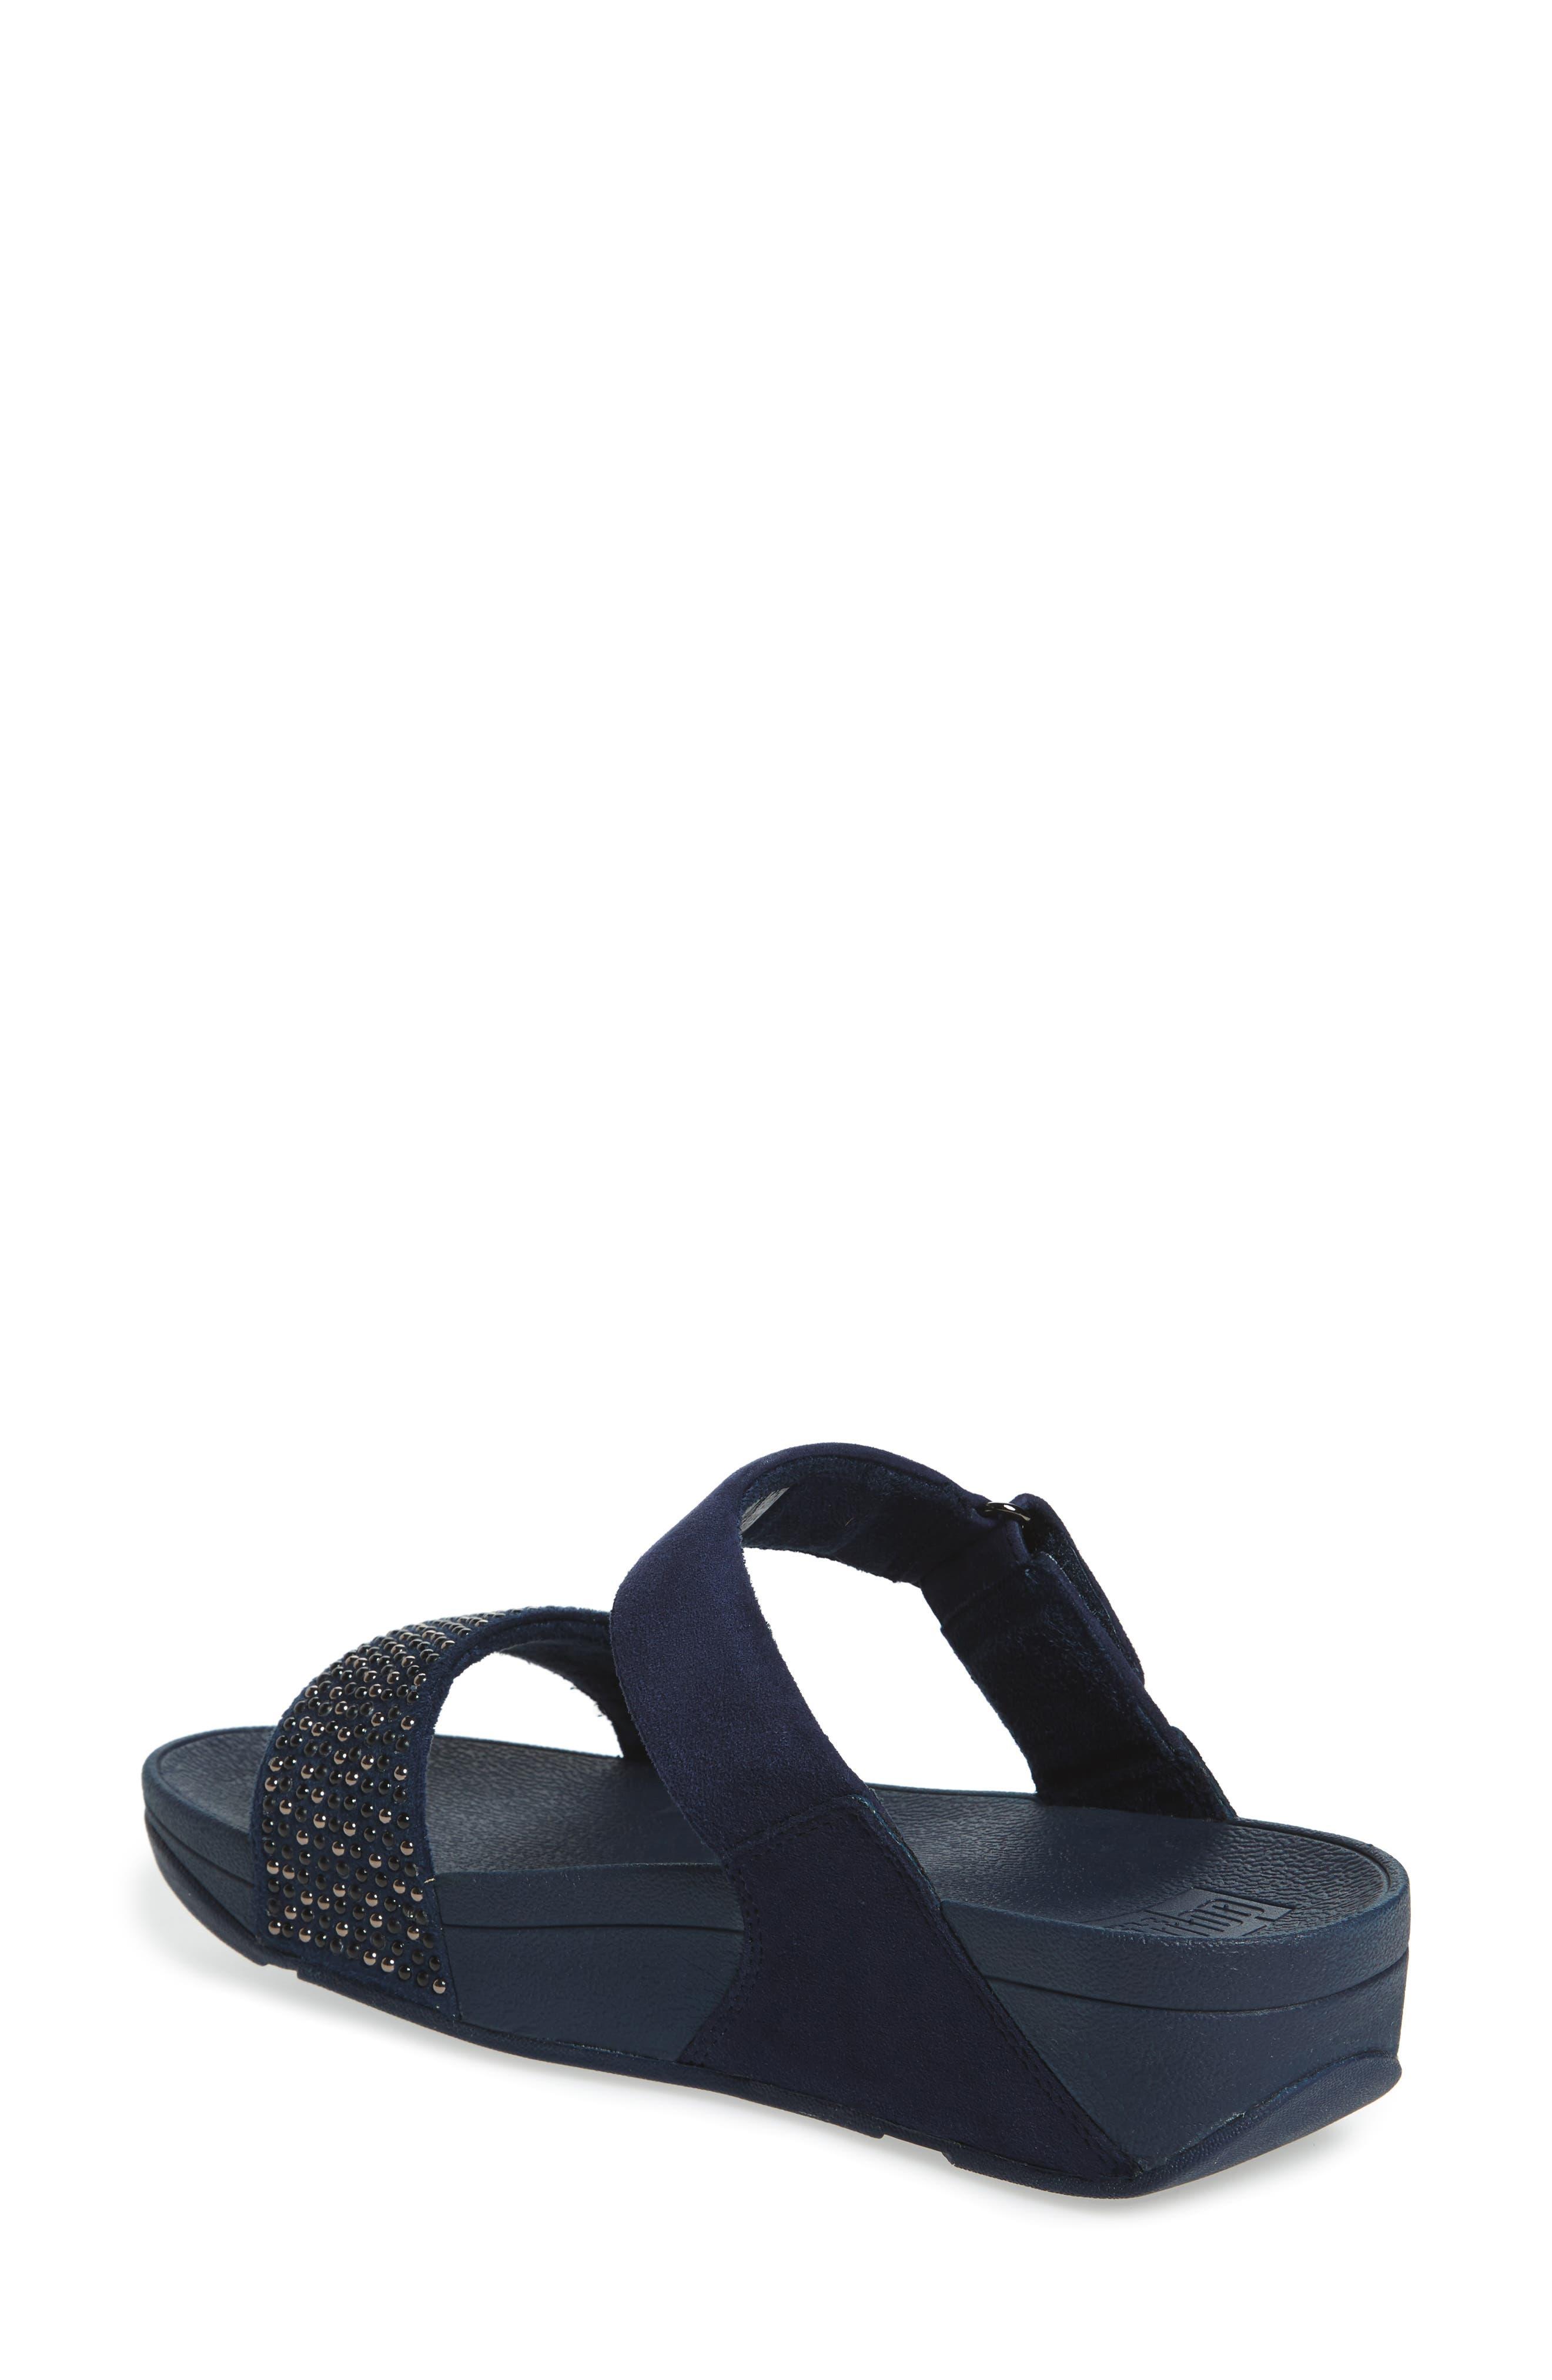 Alternate Image 2  - FitFlop Lulu Popstud Wedge Slide Sandal (Women)